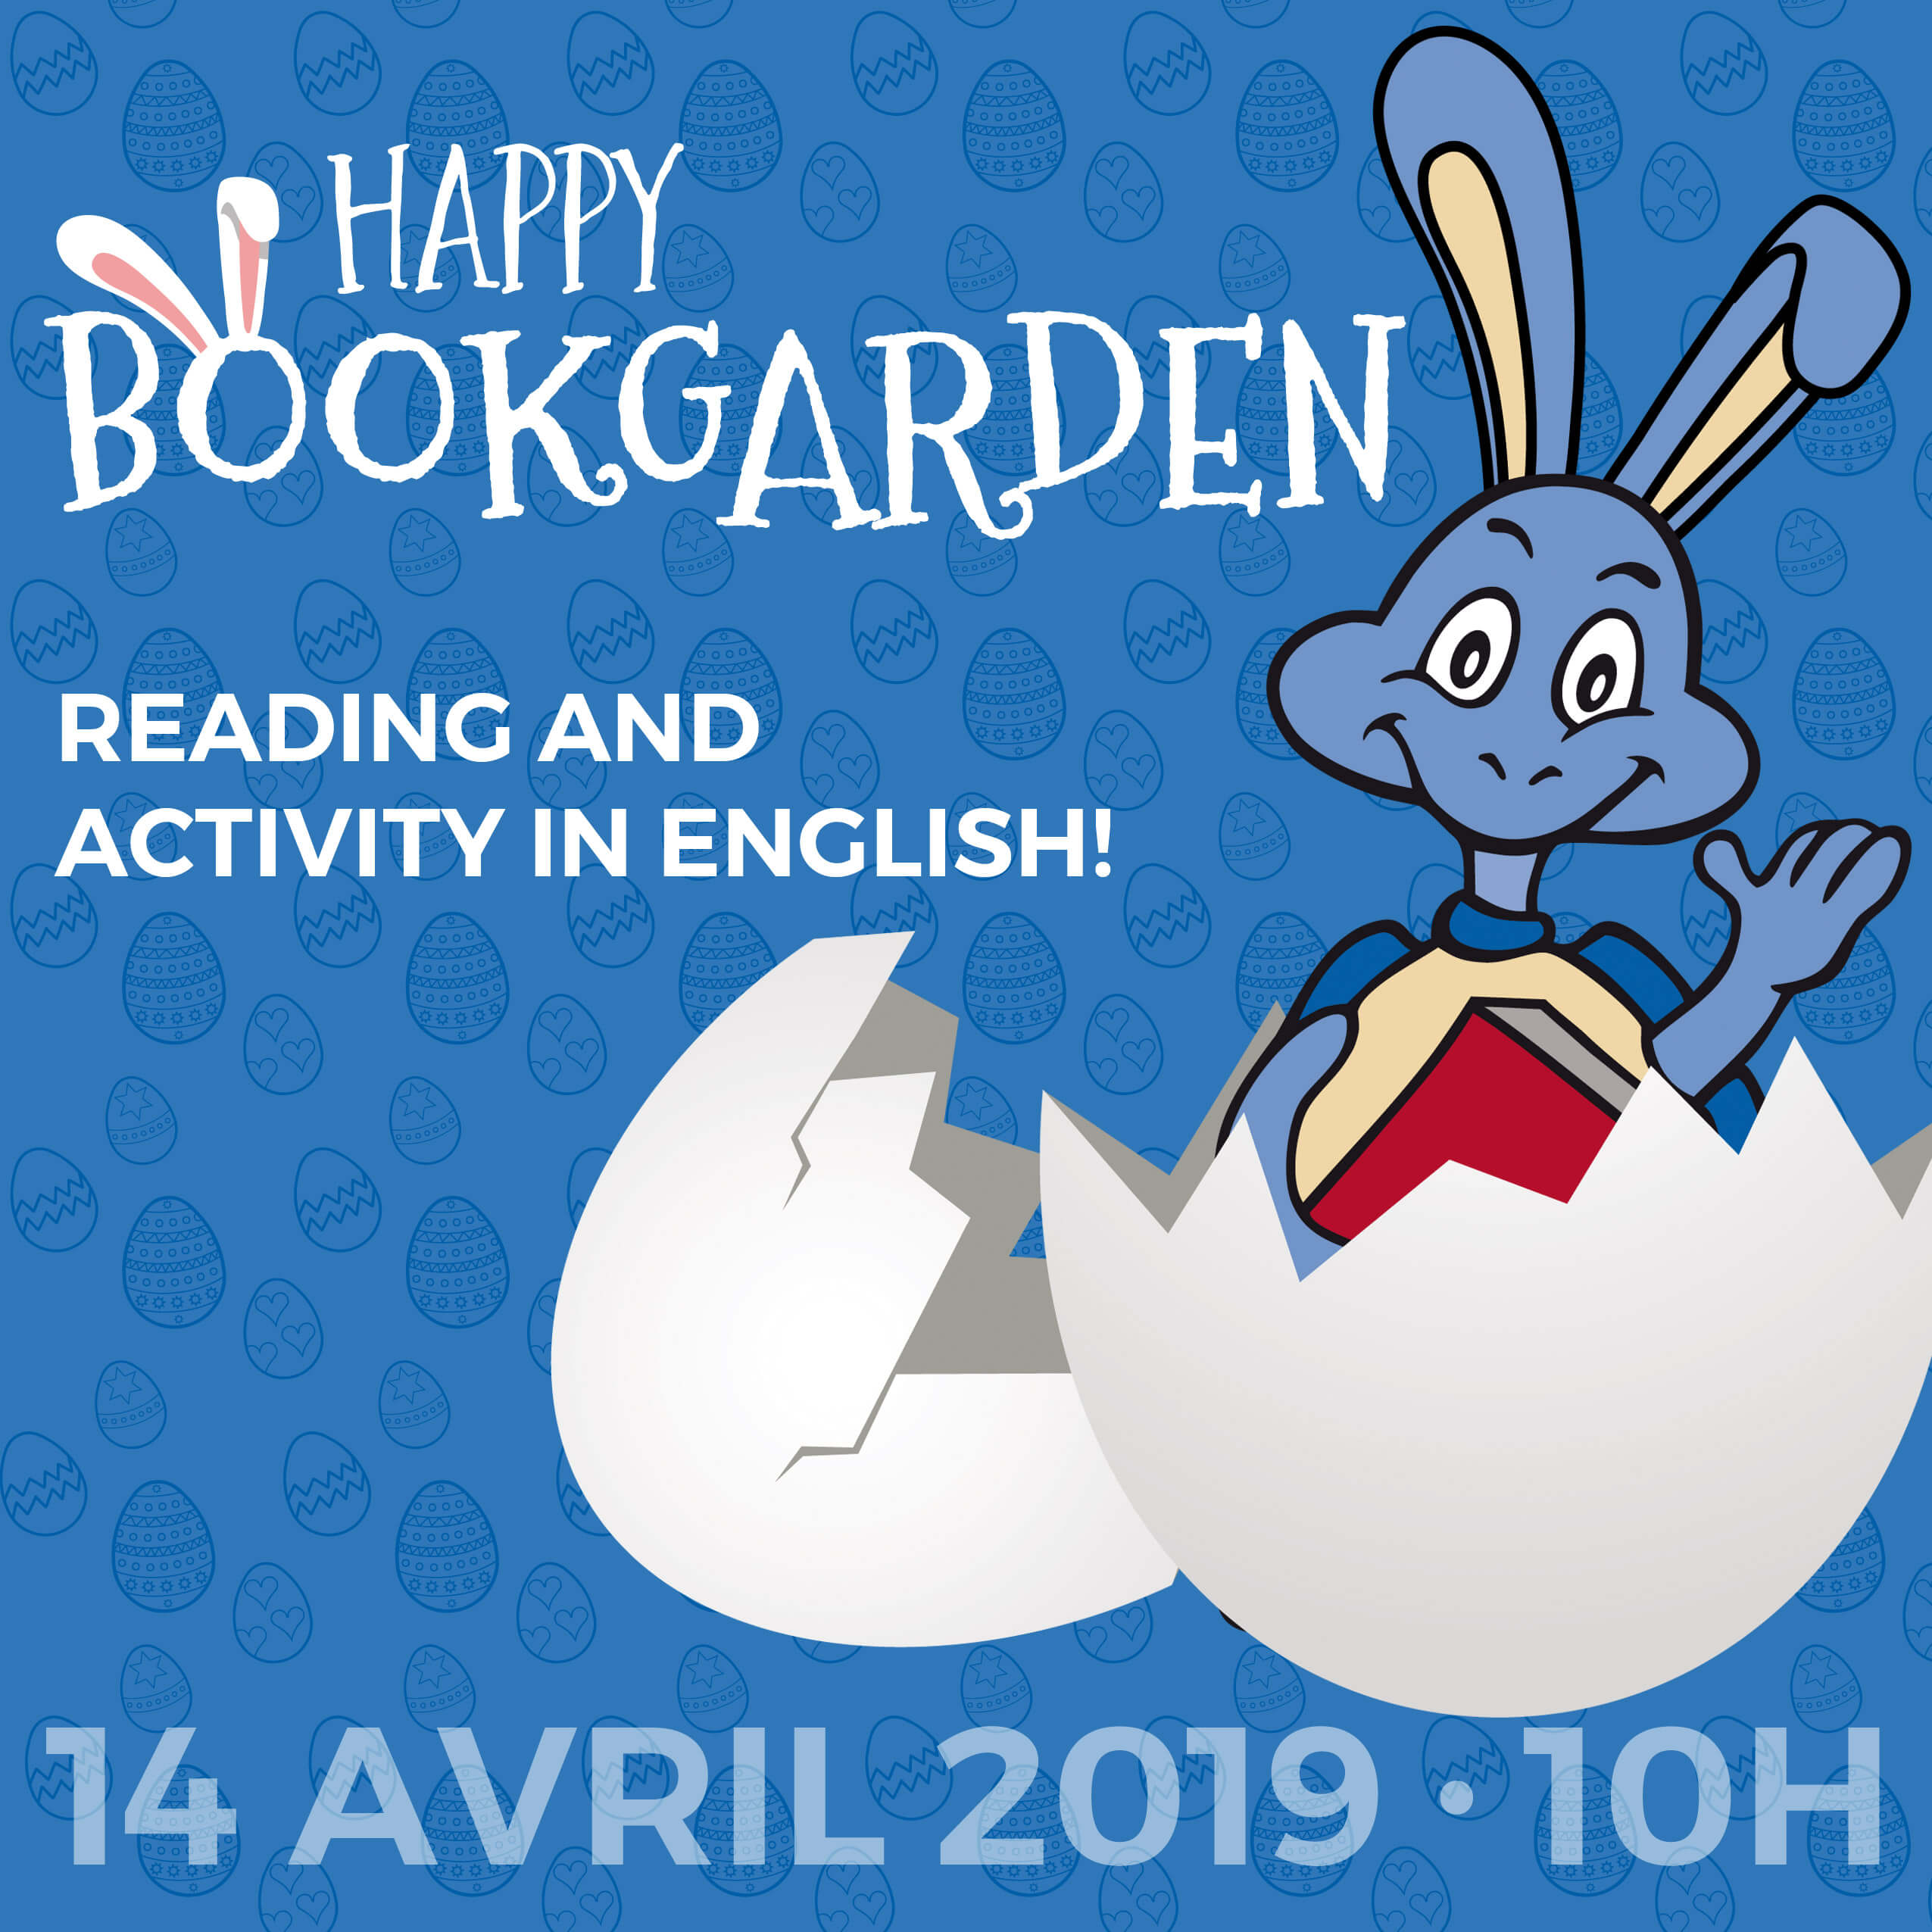 Bookgarden Happy Easter